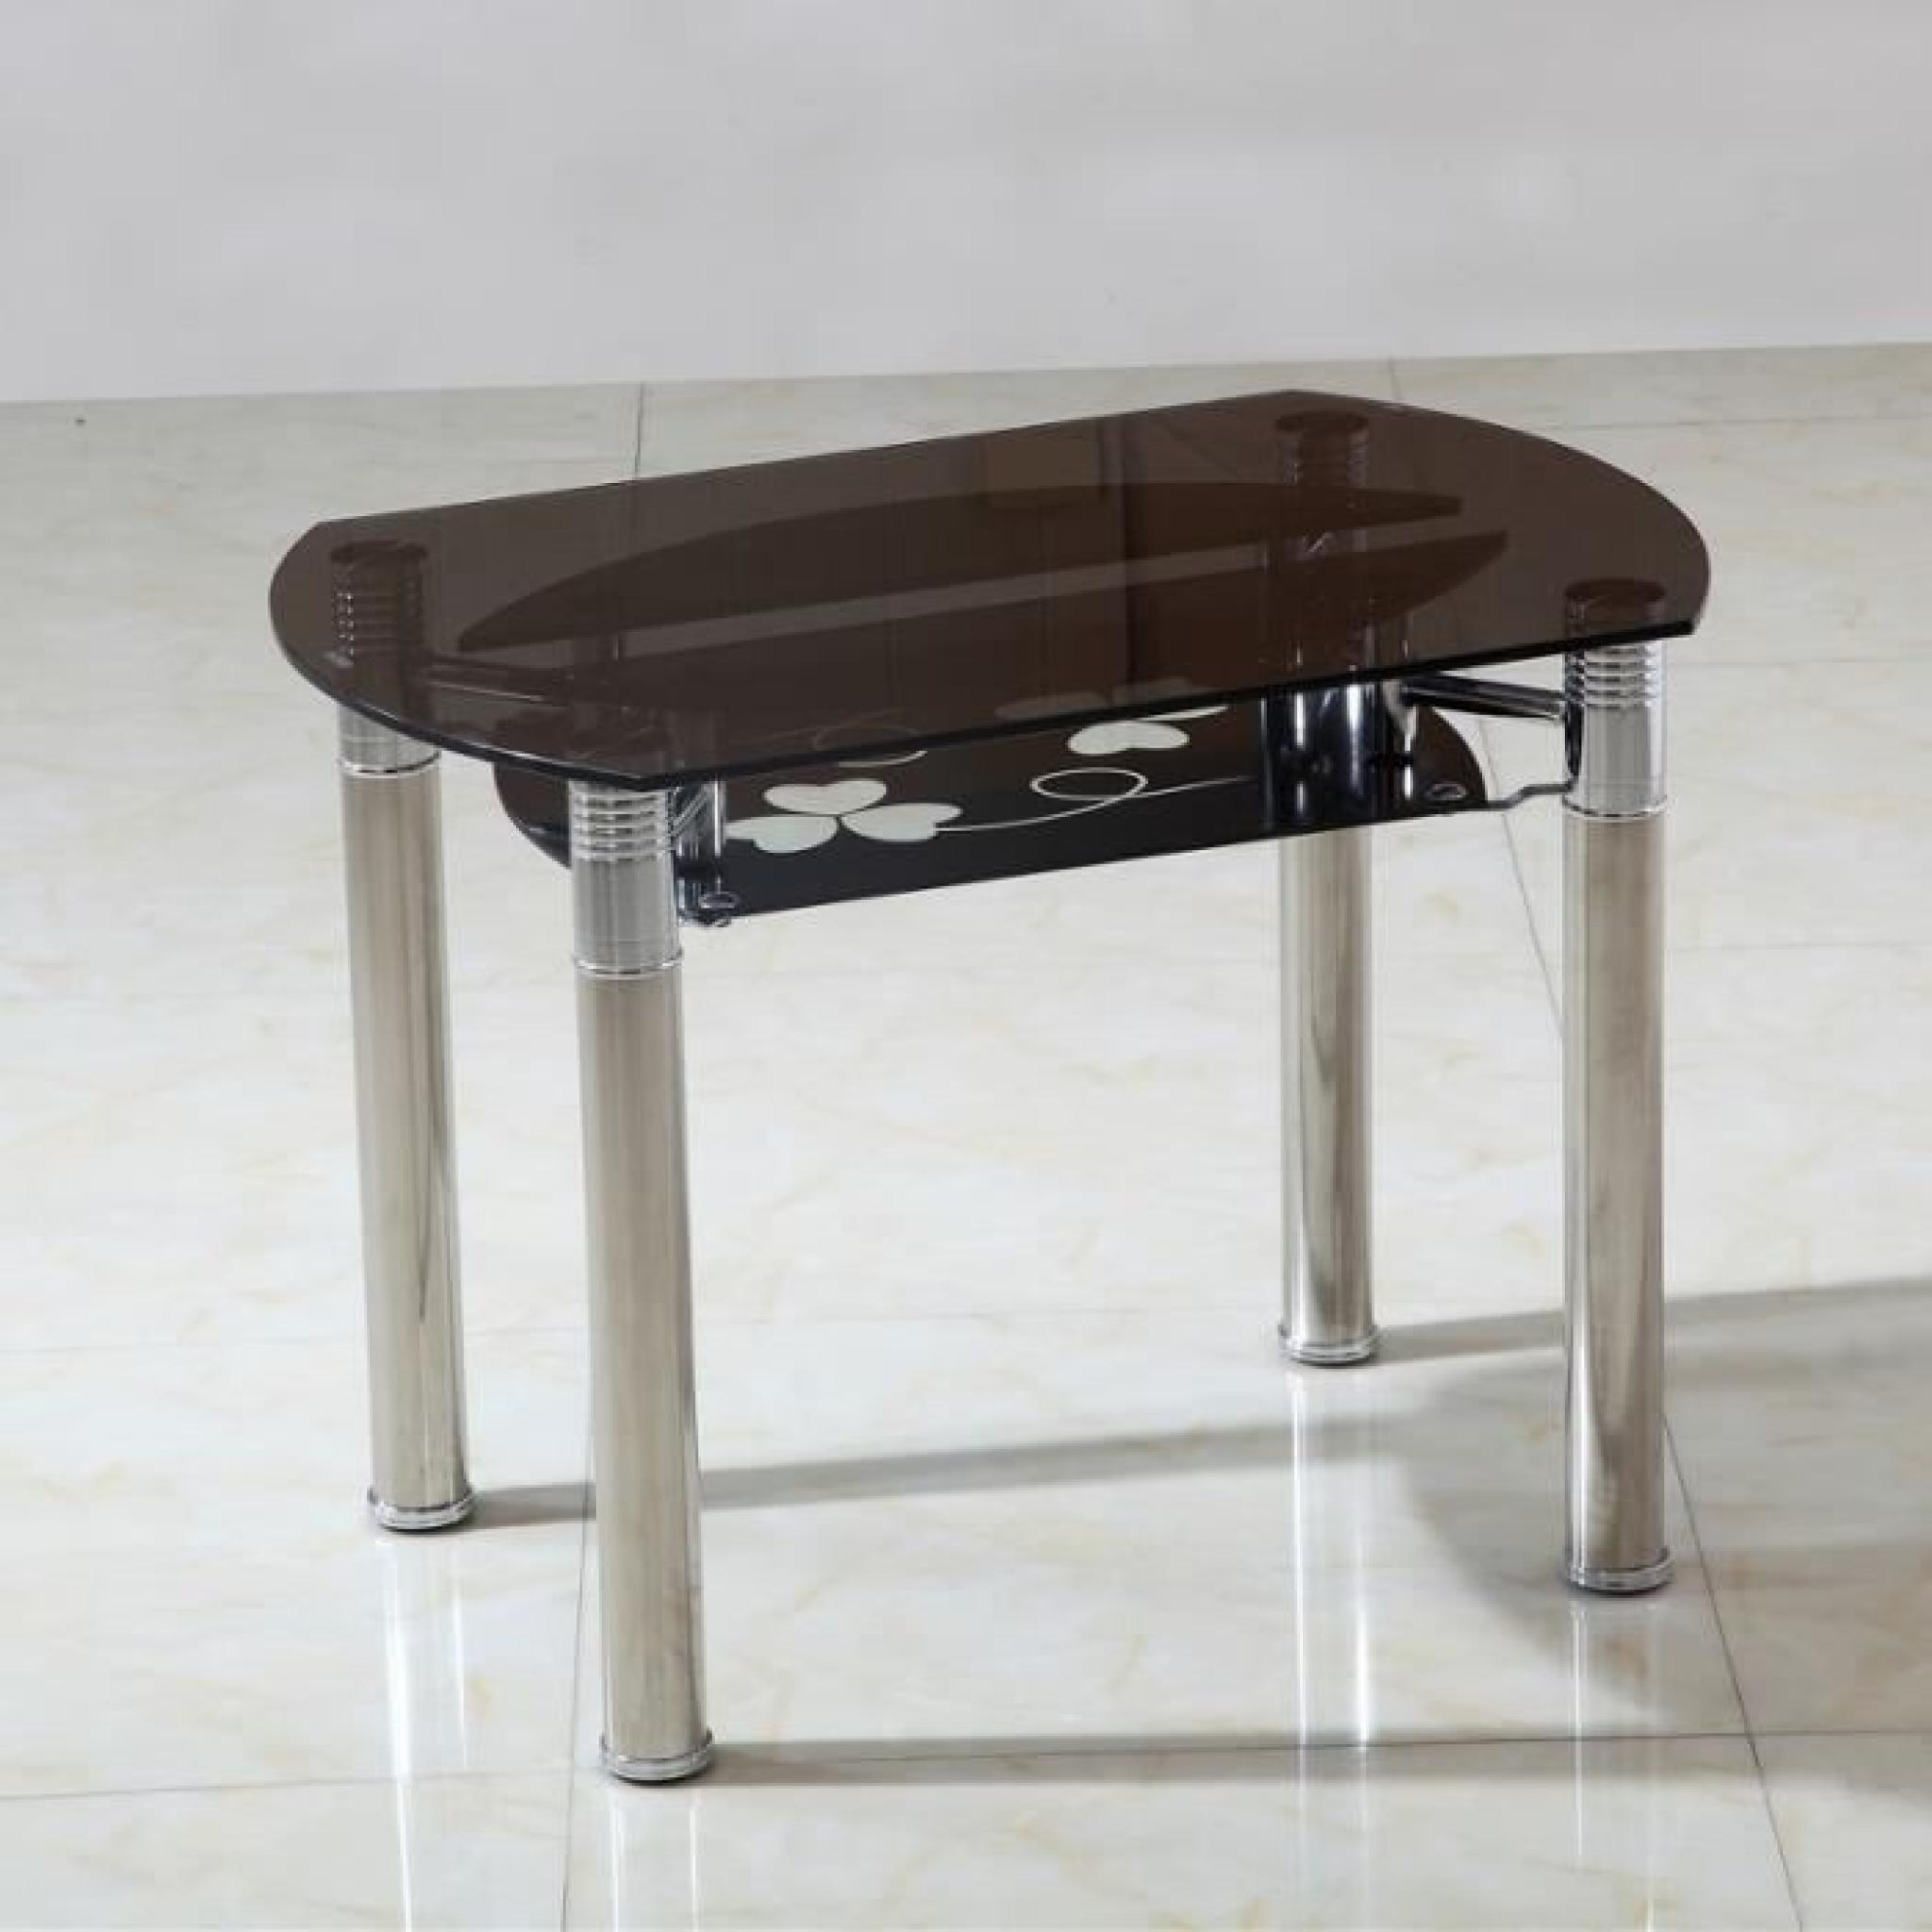 Table ronde extensible en verre fumé Tinos Ø 130 cm